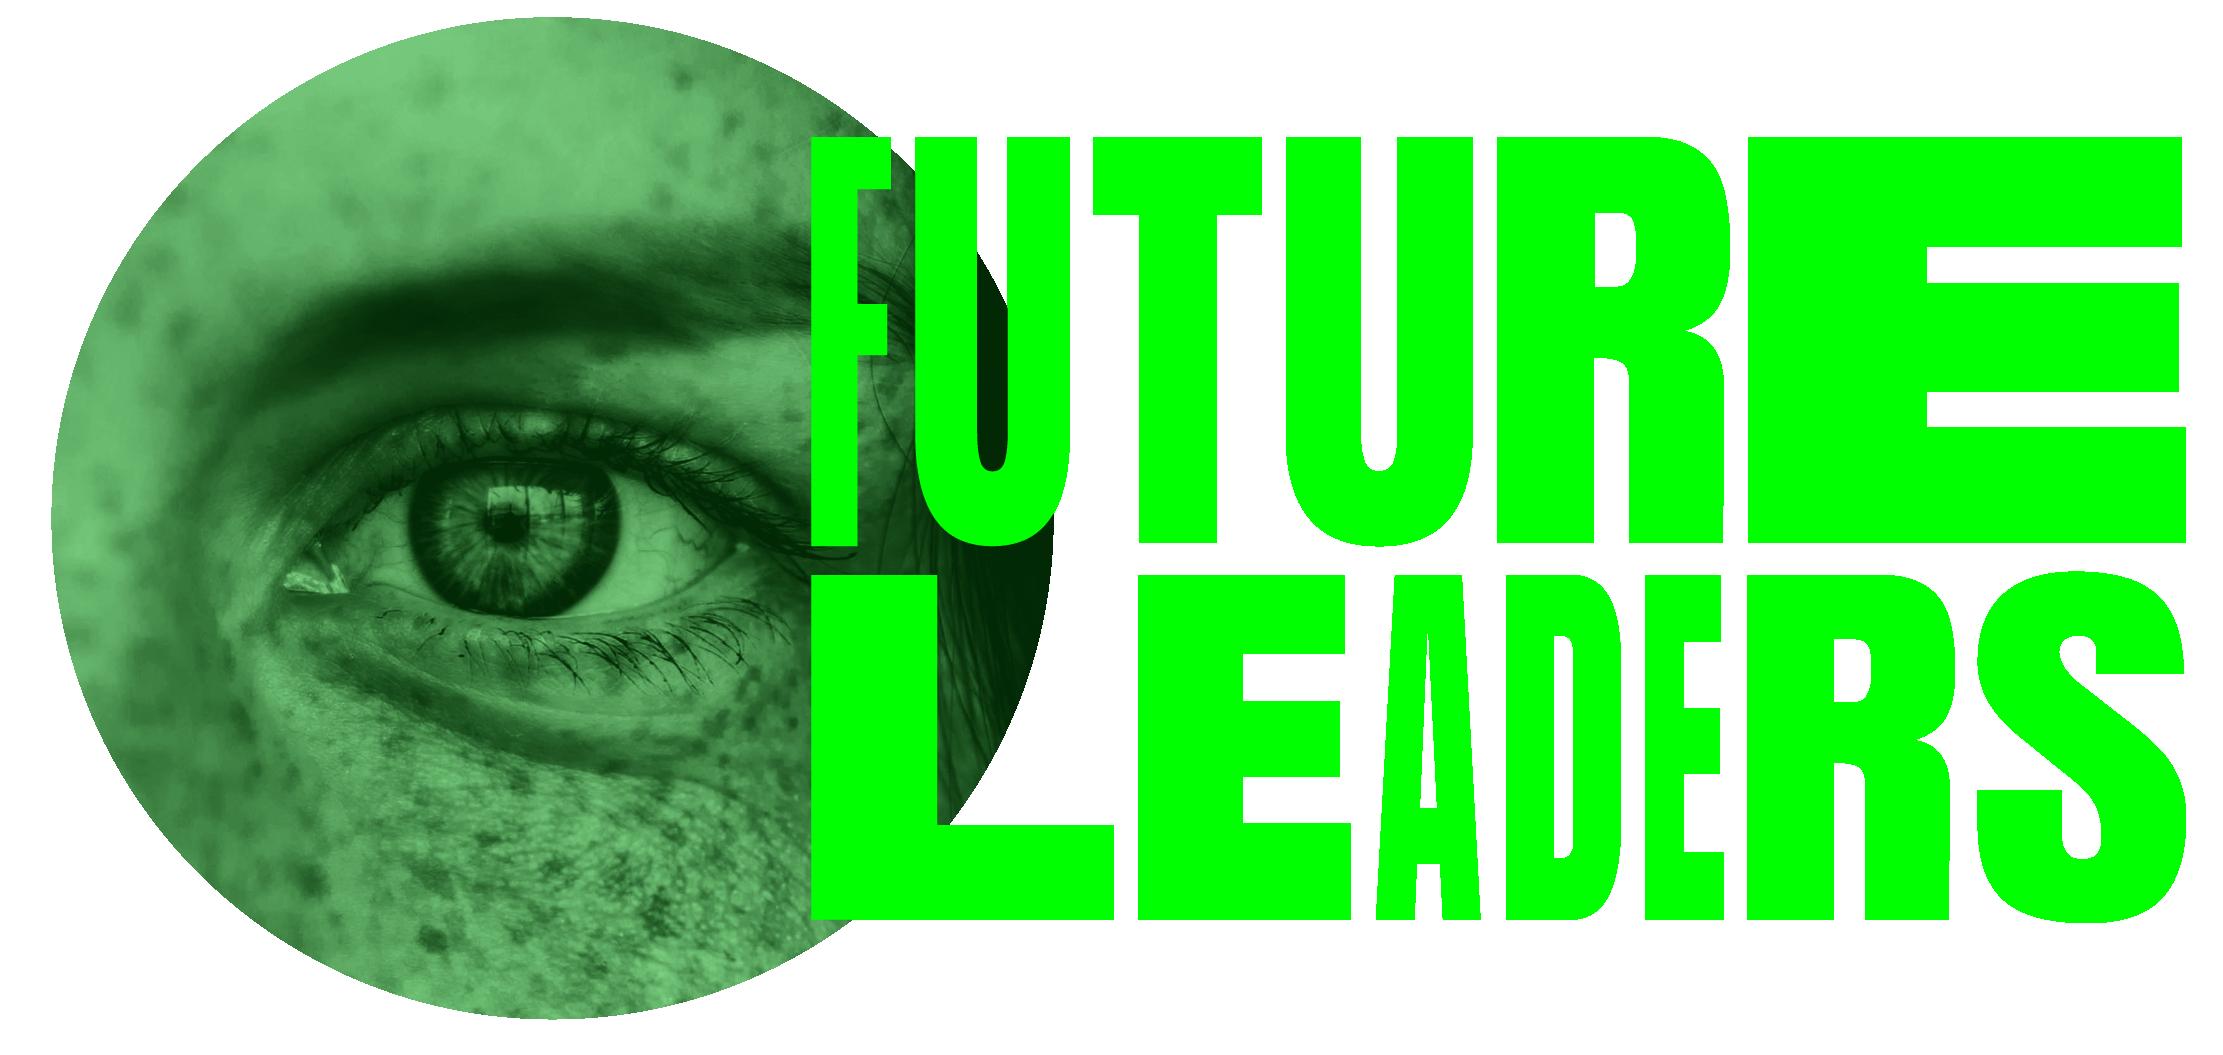 200910_FutureLeaders_ImgLanding-02